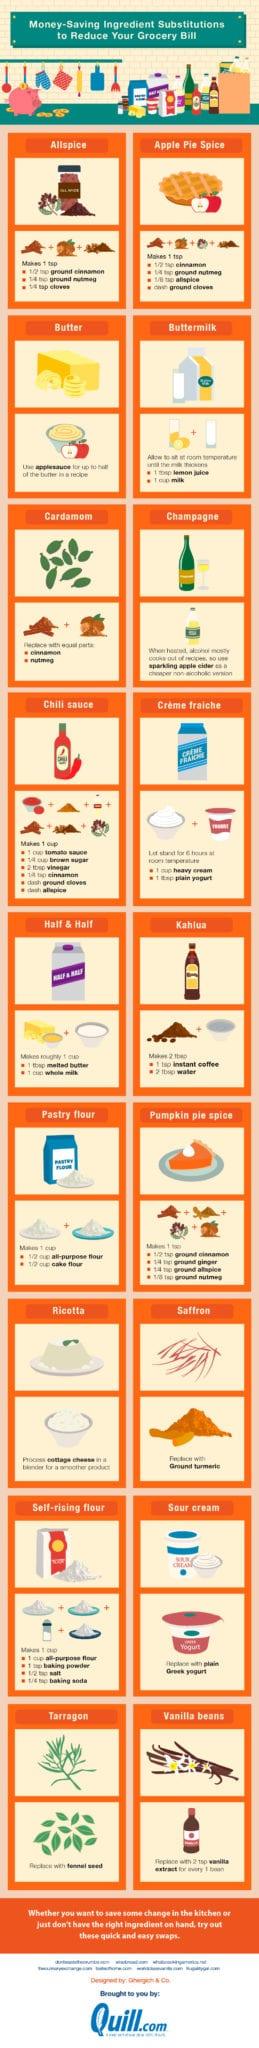 ingredient substitutions